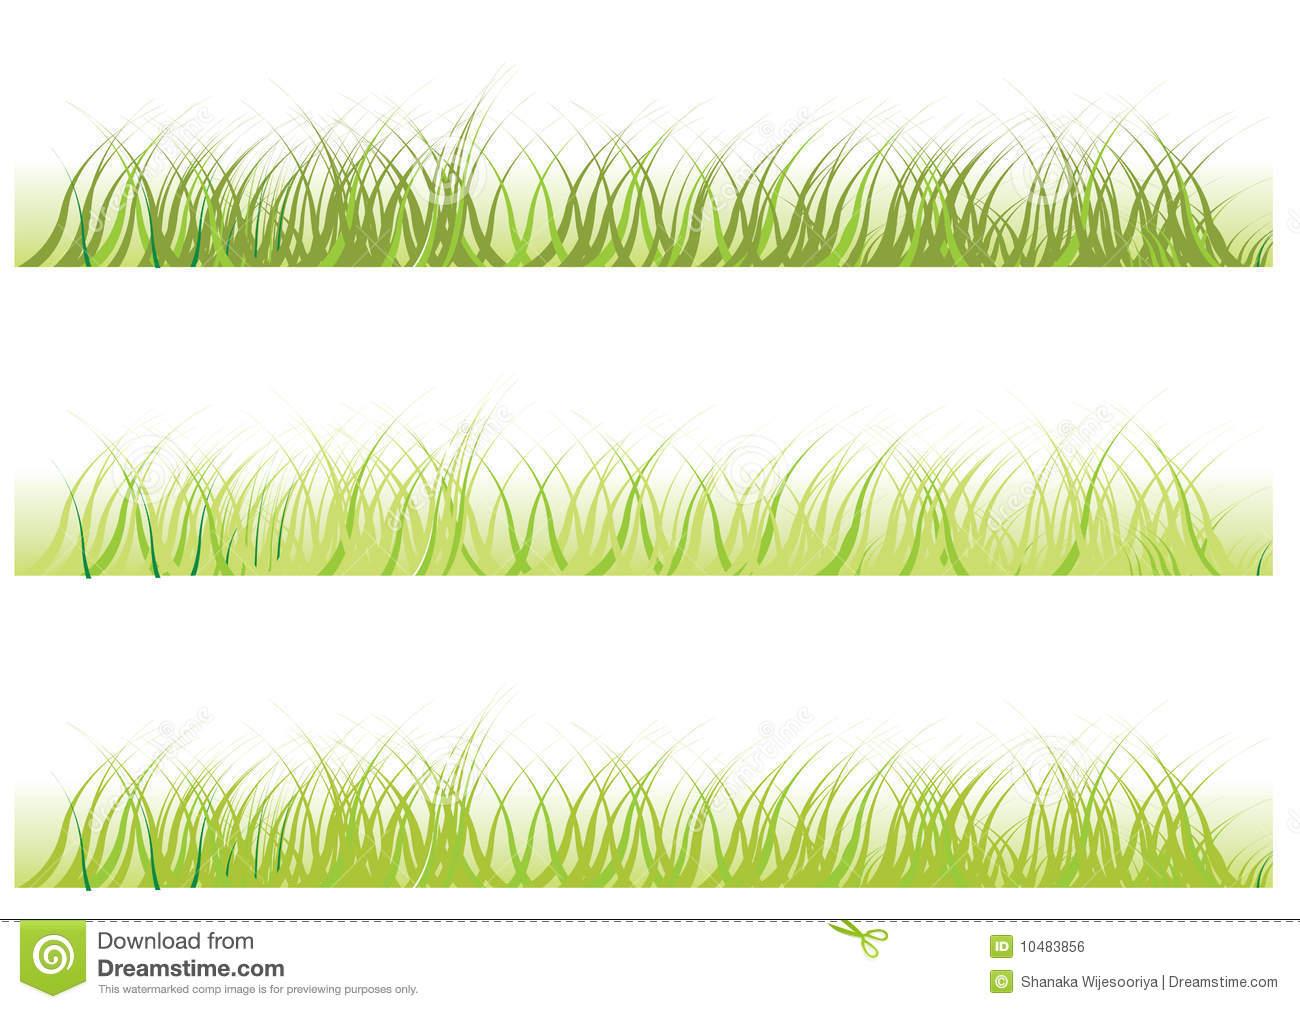 free vector clipart grass - photo #47